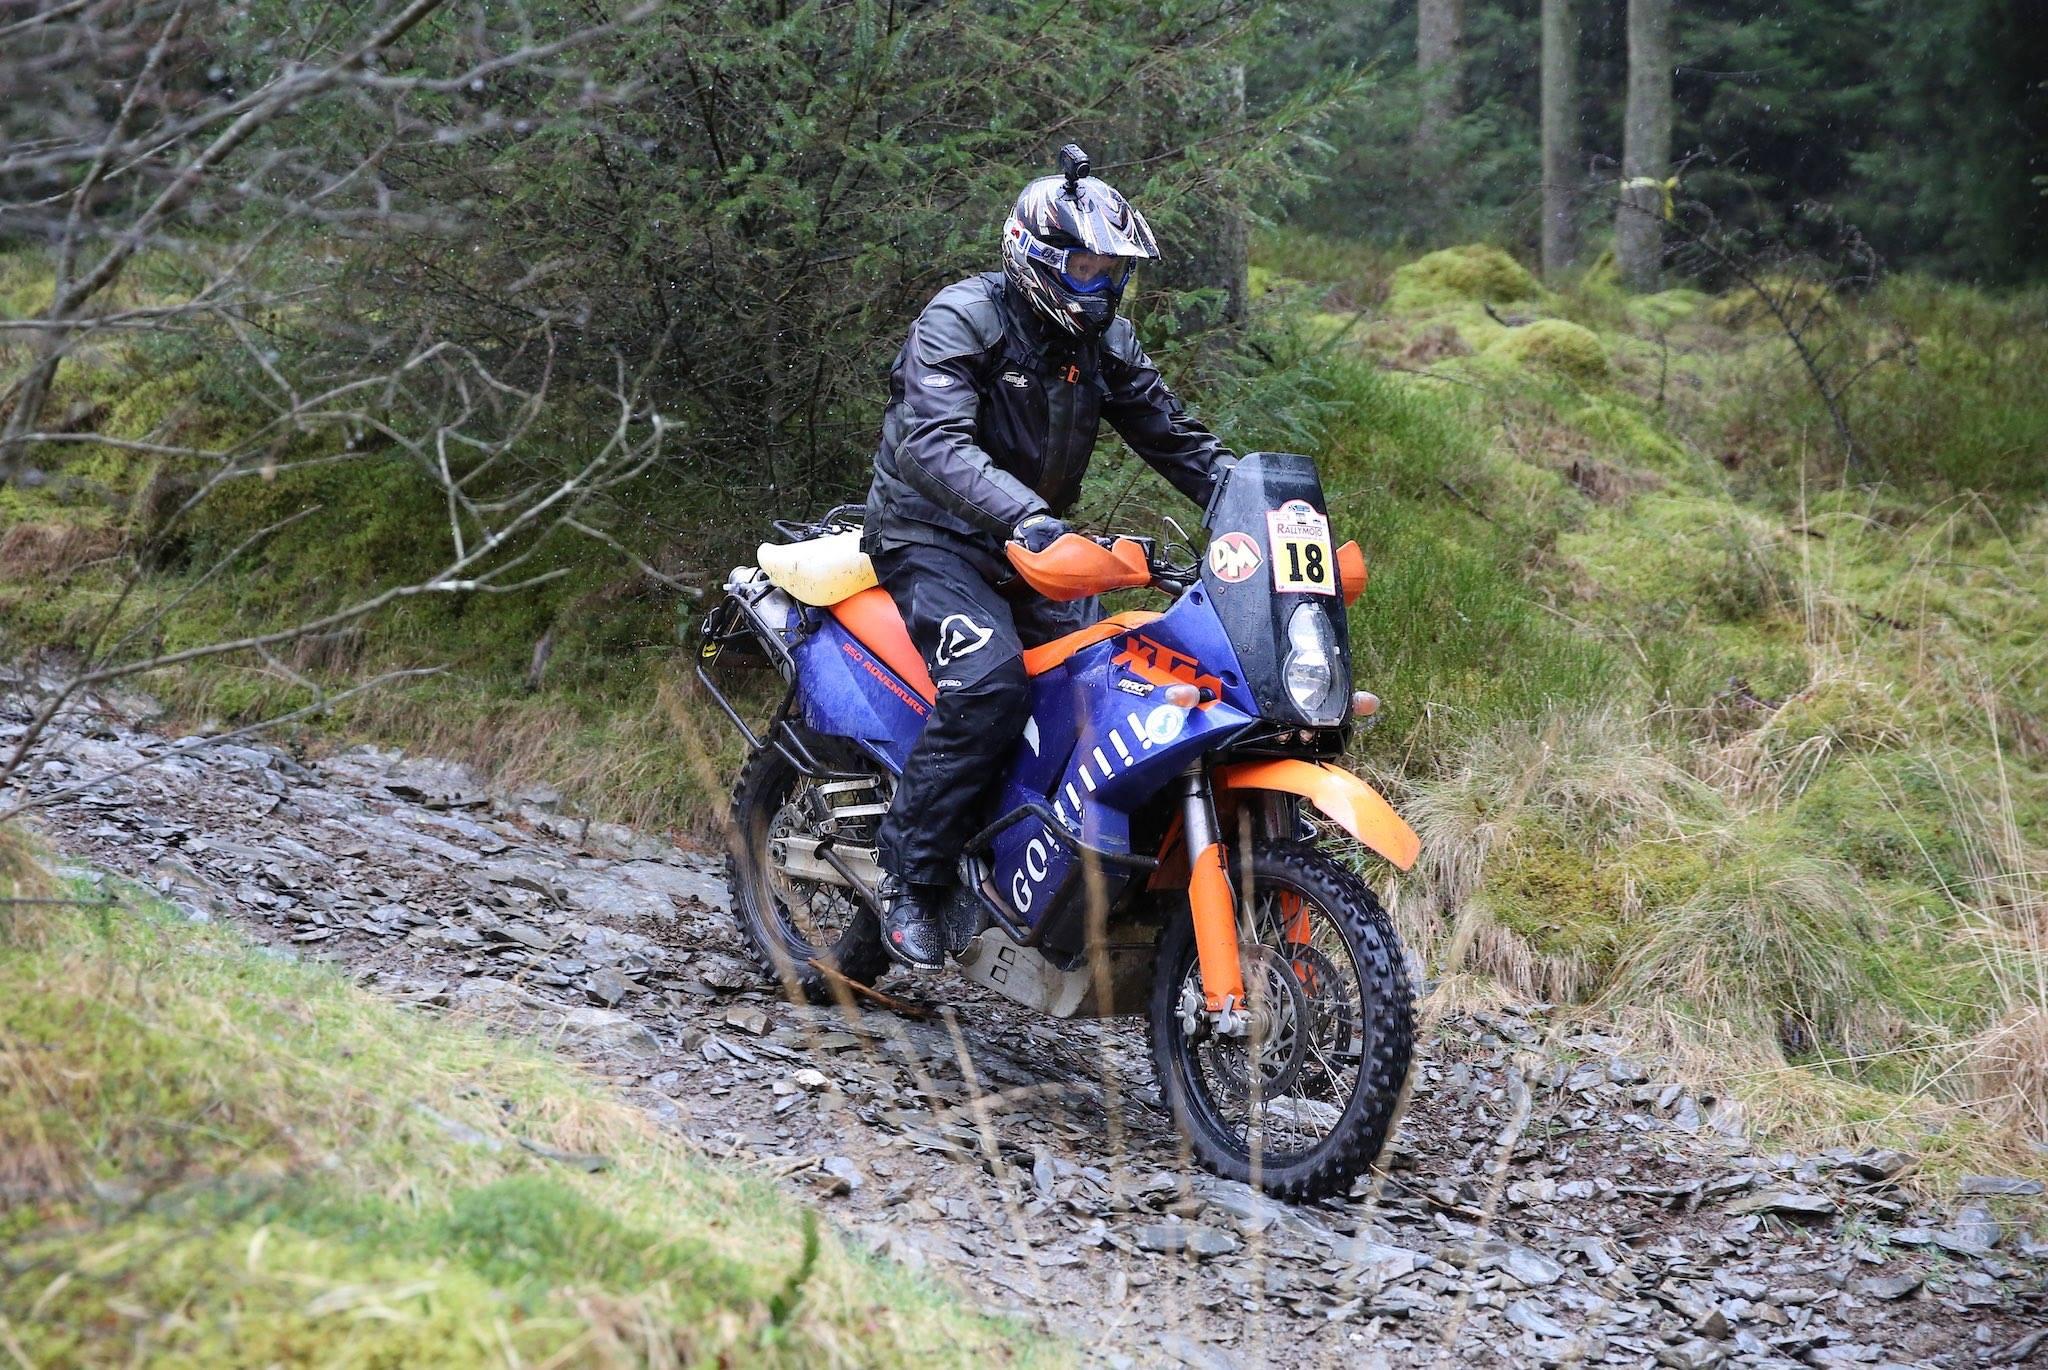 Big Bike Rally Challenge is coming back